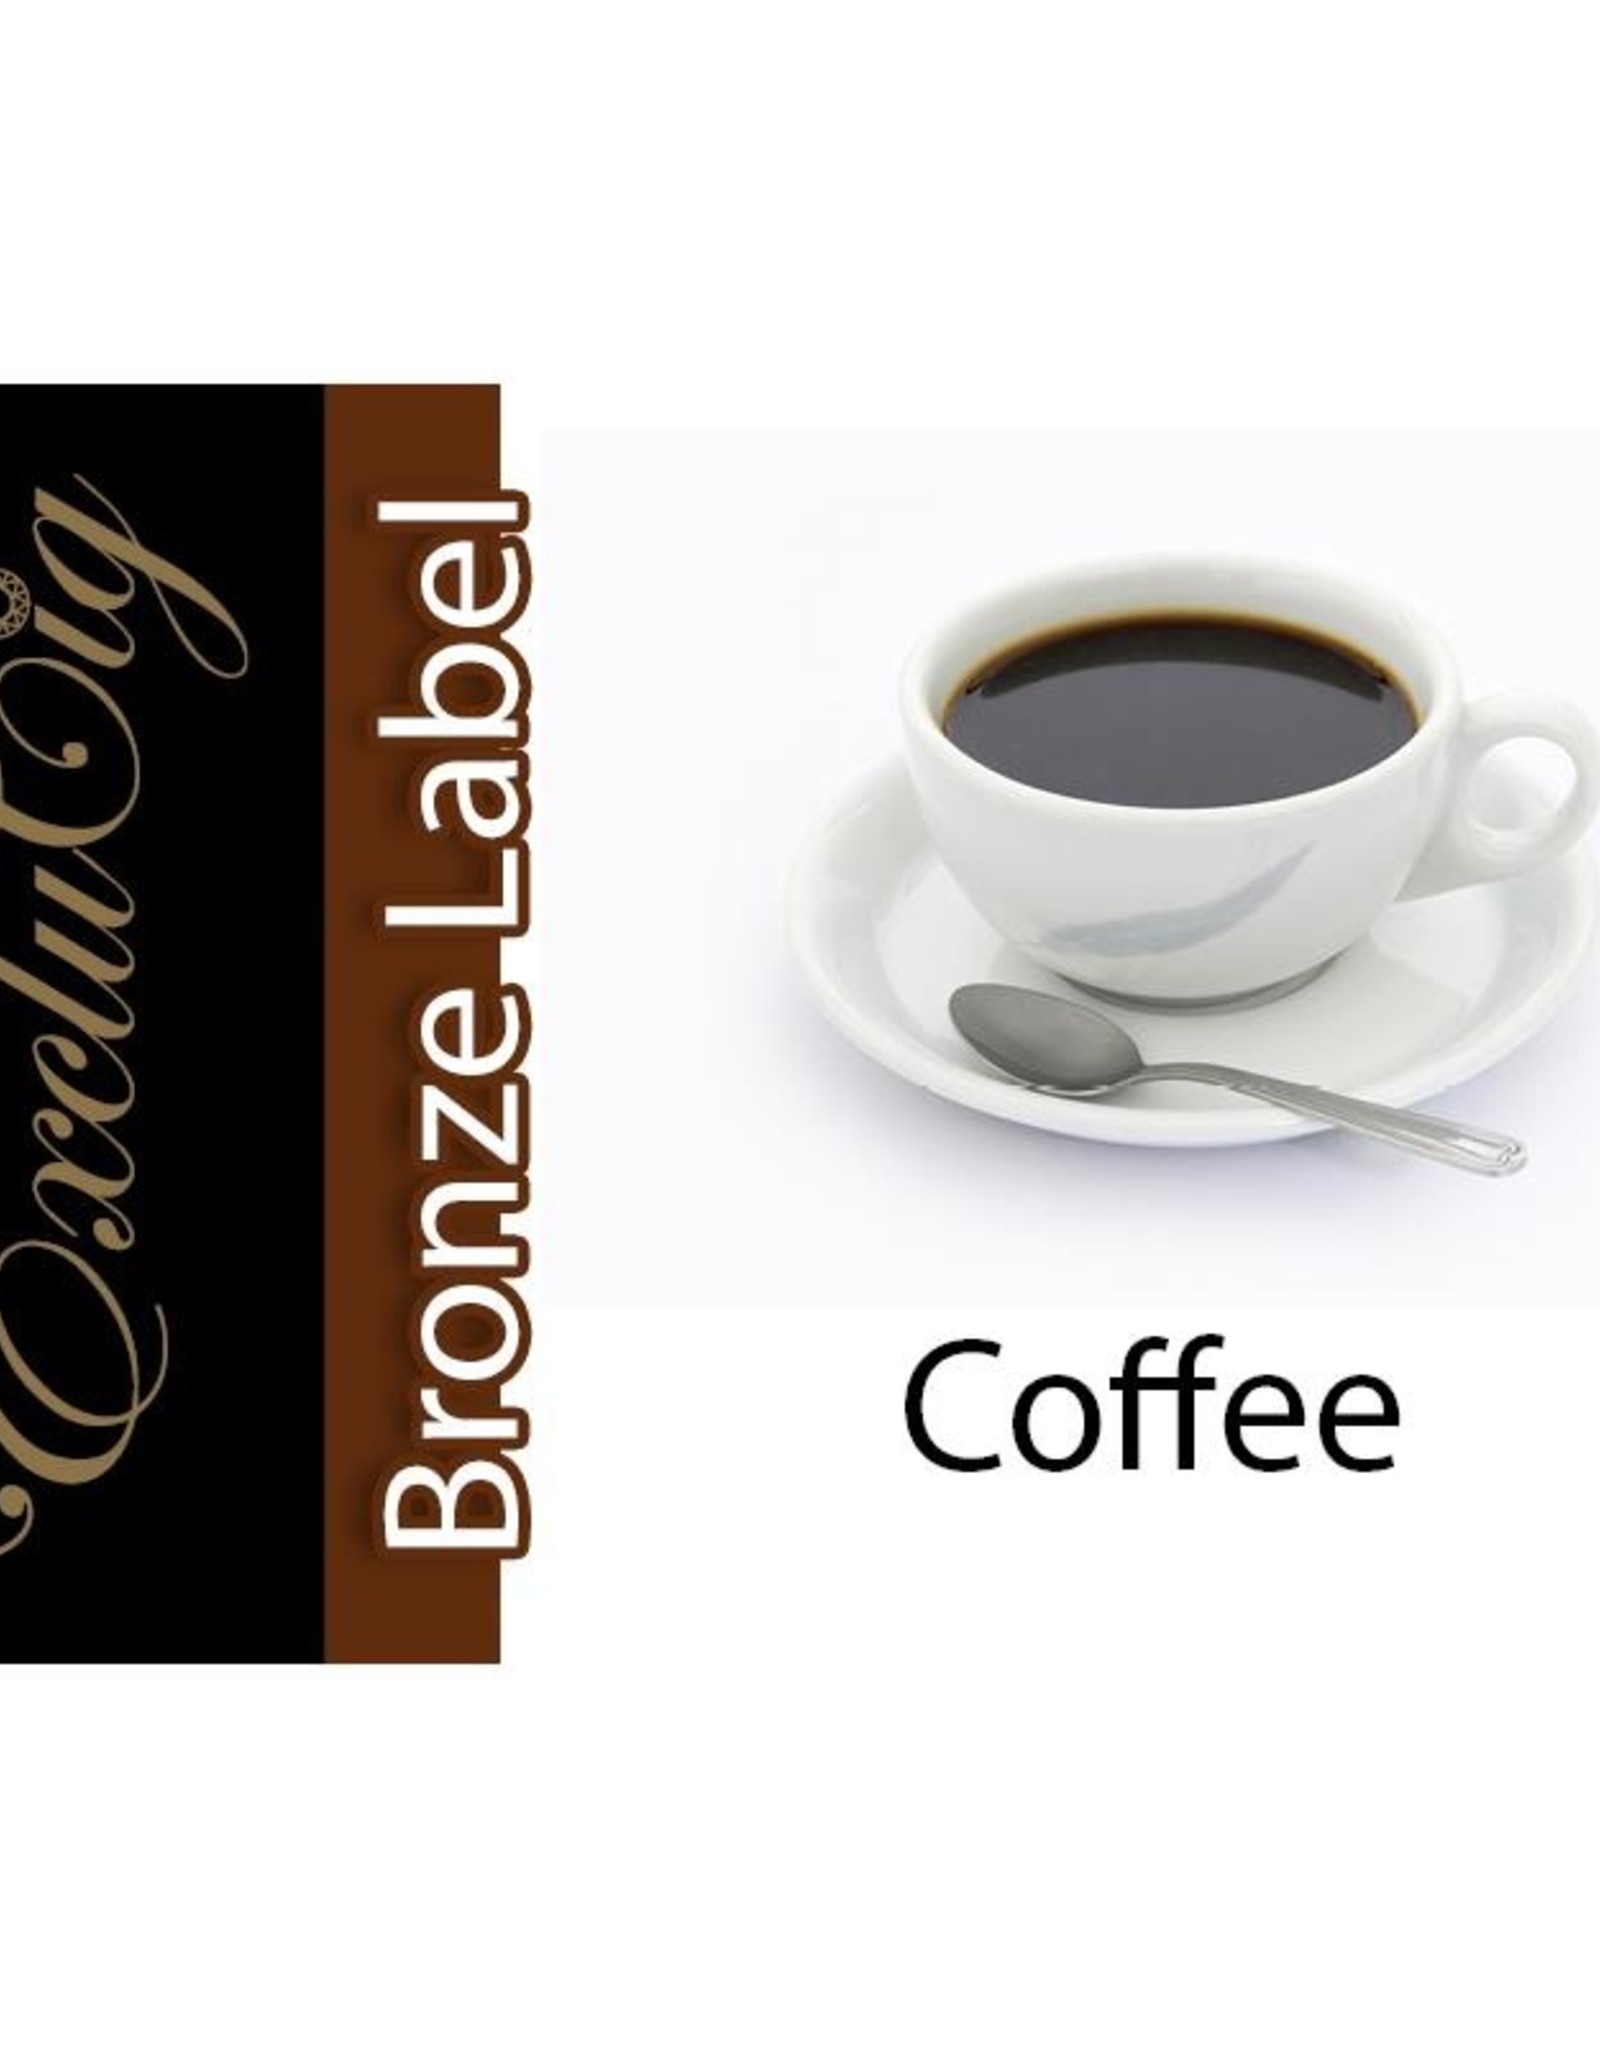 Exclucig Exclucig Bronze Label E-liquid Coffee 12 mg Nicotine